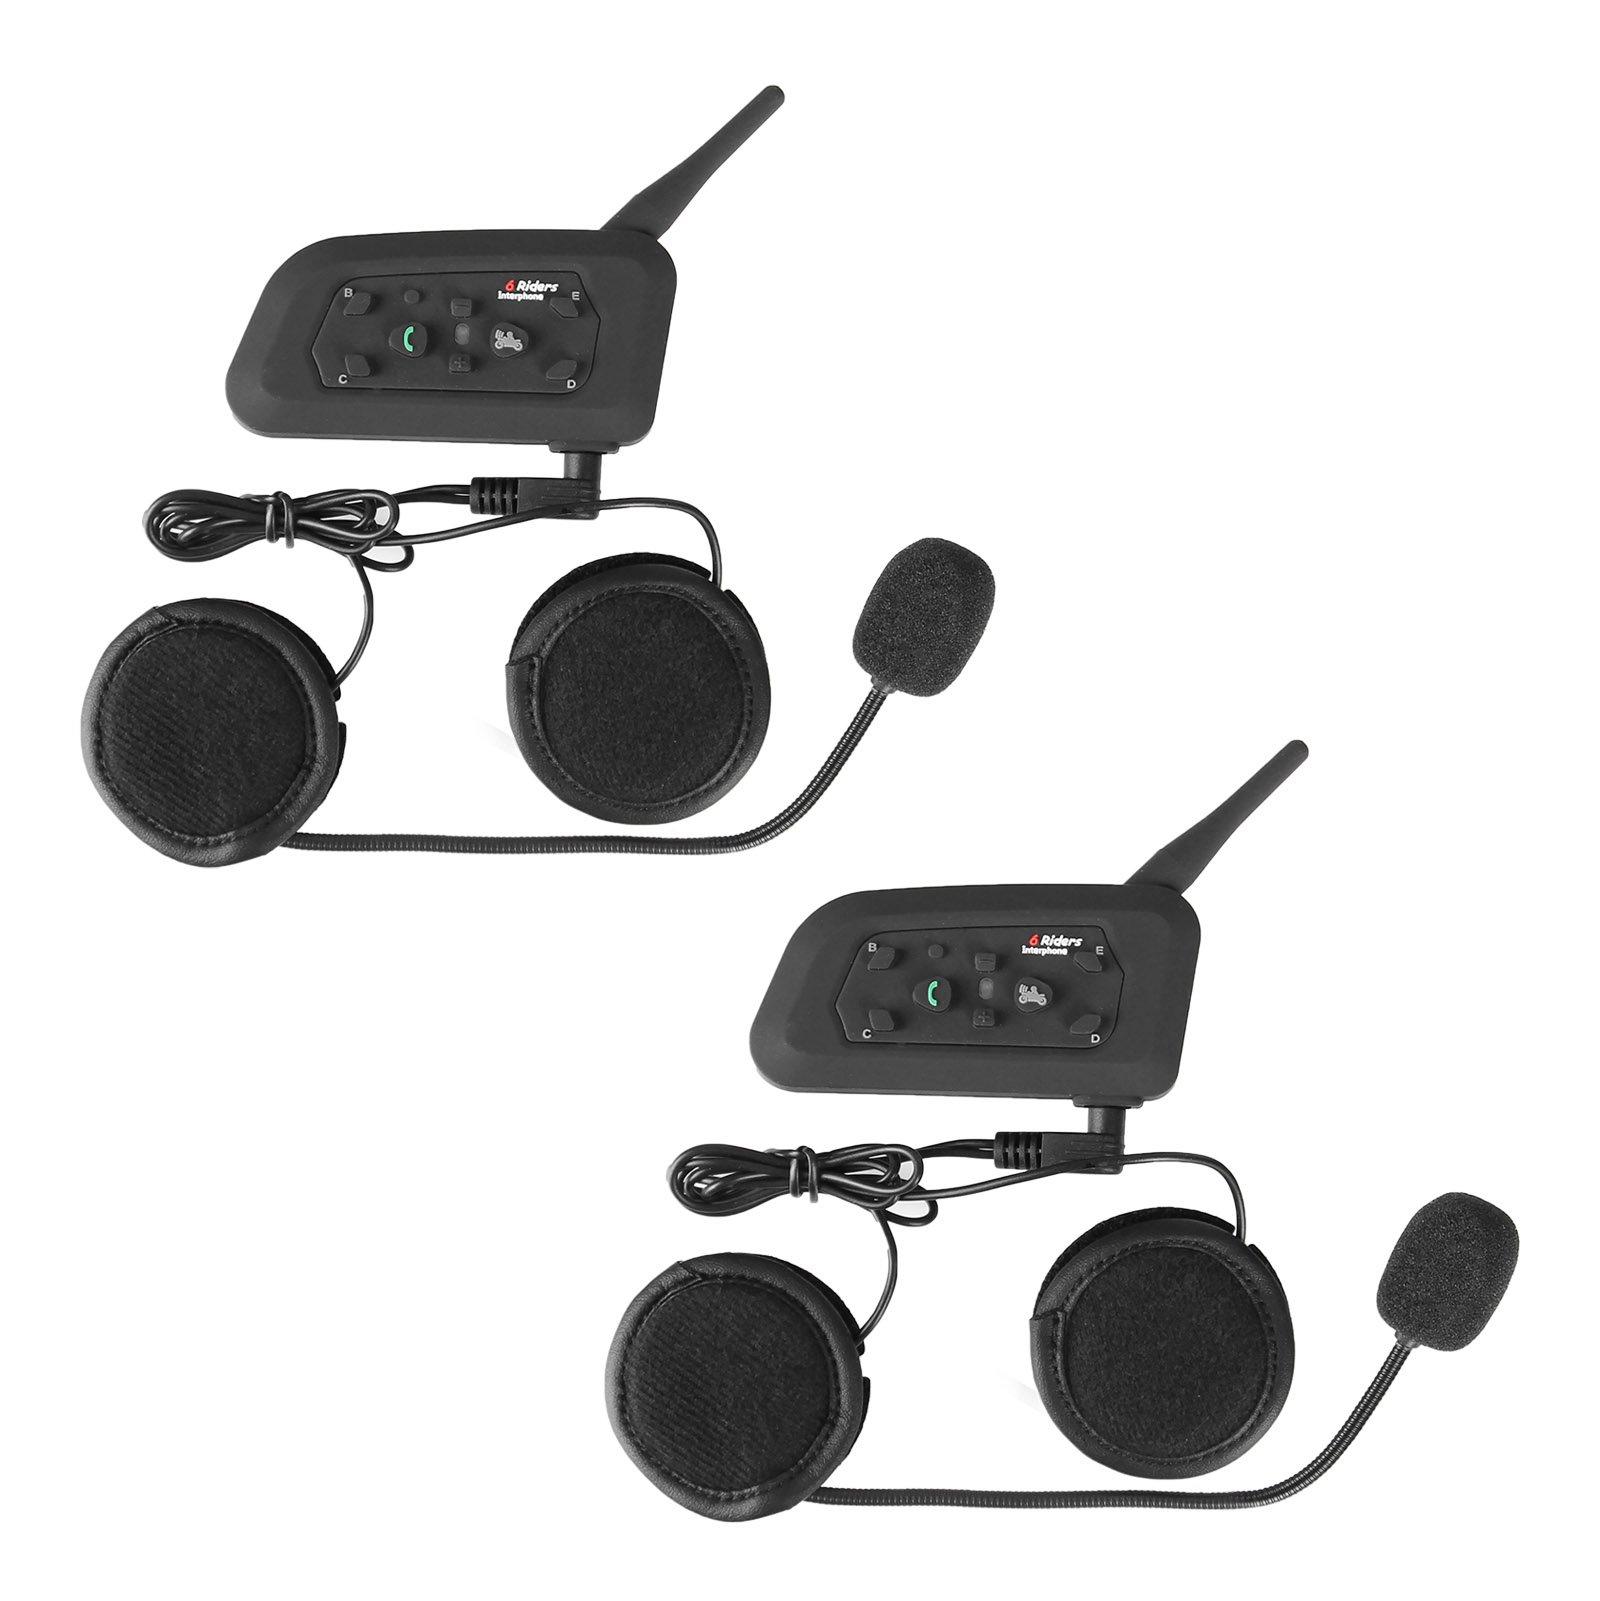 heneng Motorcycle Helmet Wireless Headset Intercom Full-face Sport Speaker Low Profile Wireless Headphone 6 Riders Communicator 500m Talk for Riding, Trip, Cruise, Offroad, Snow Vnetphone(2 Pack)